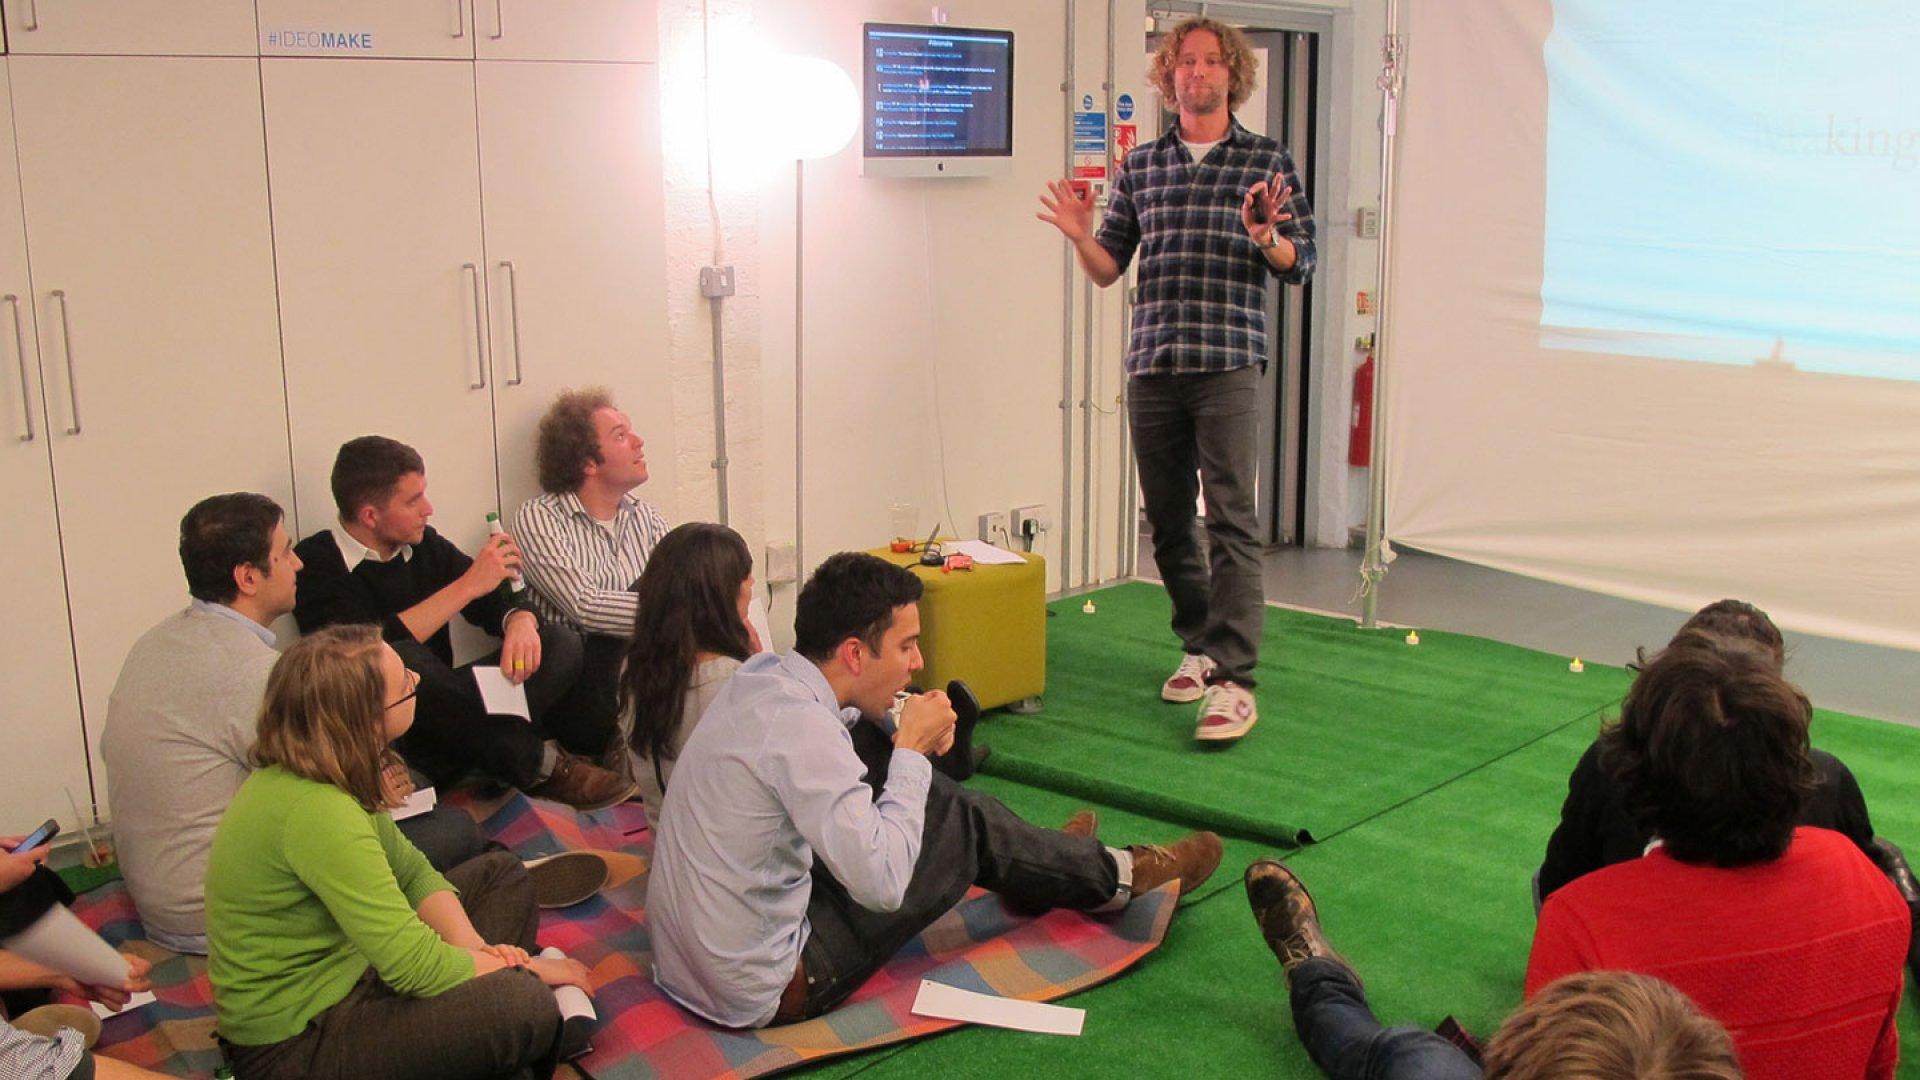 Tom Hulme, Design Director of IDEO London, makes a presentation.